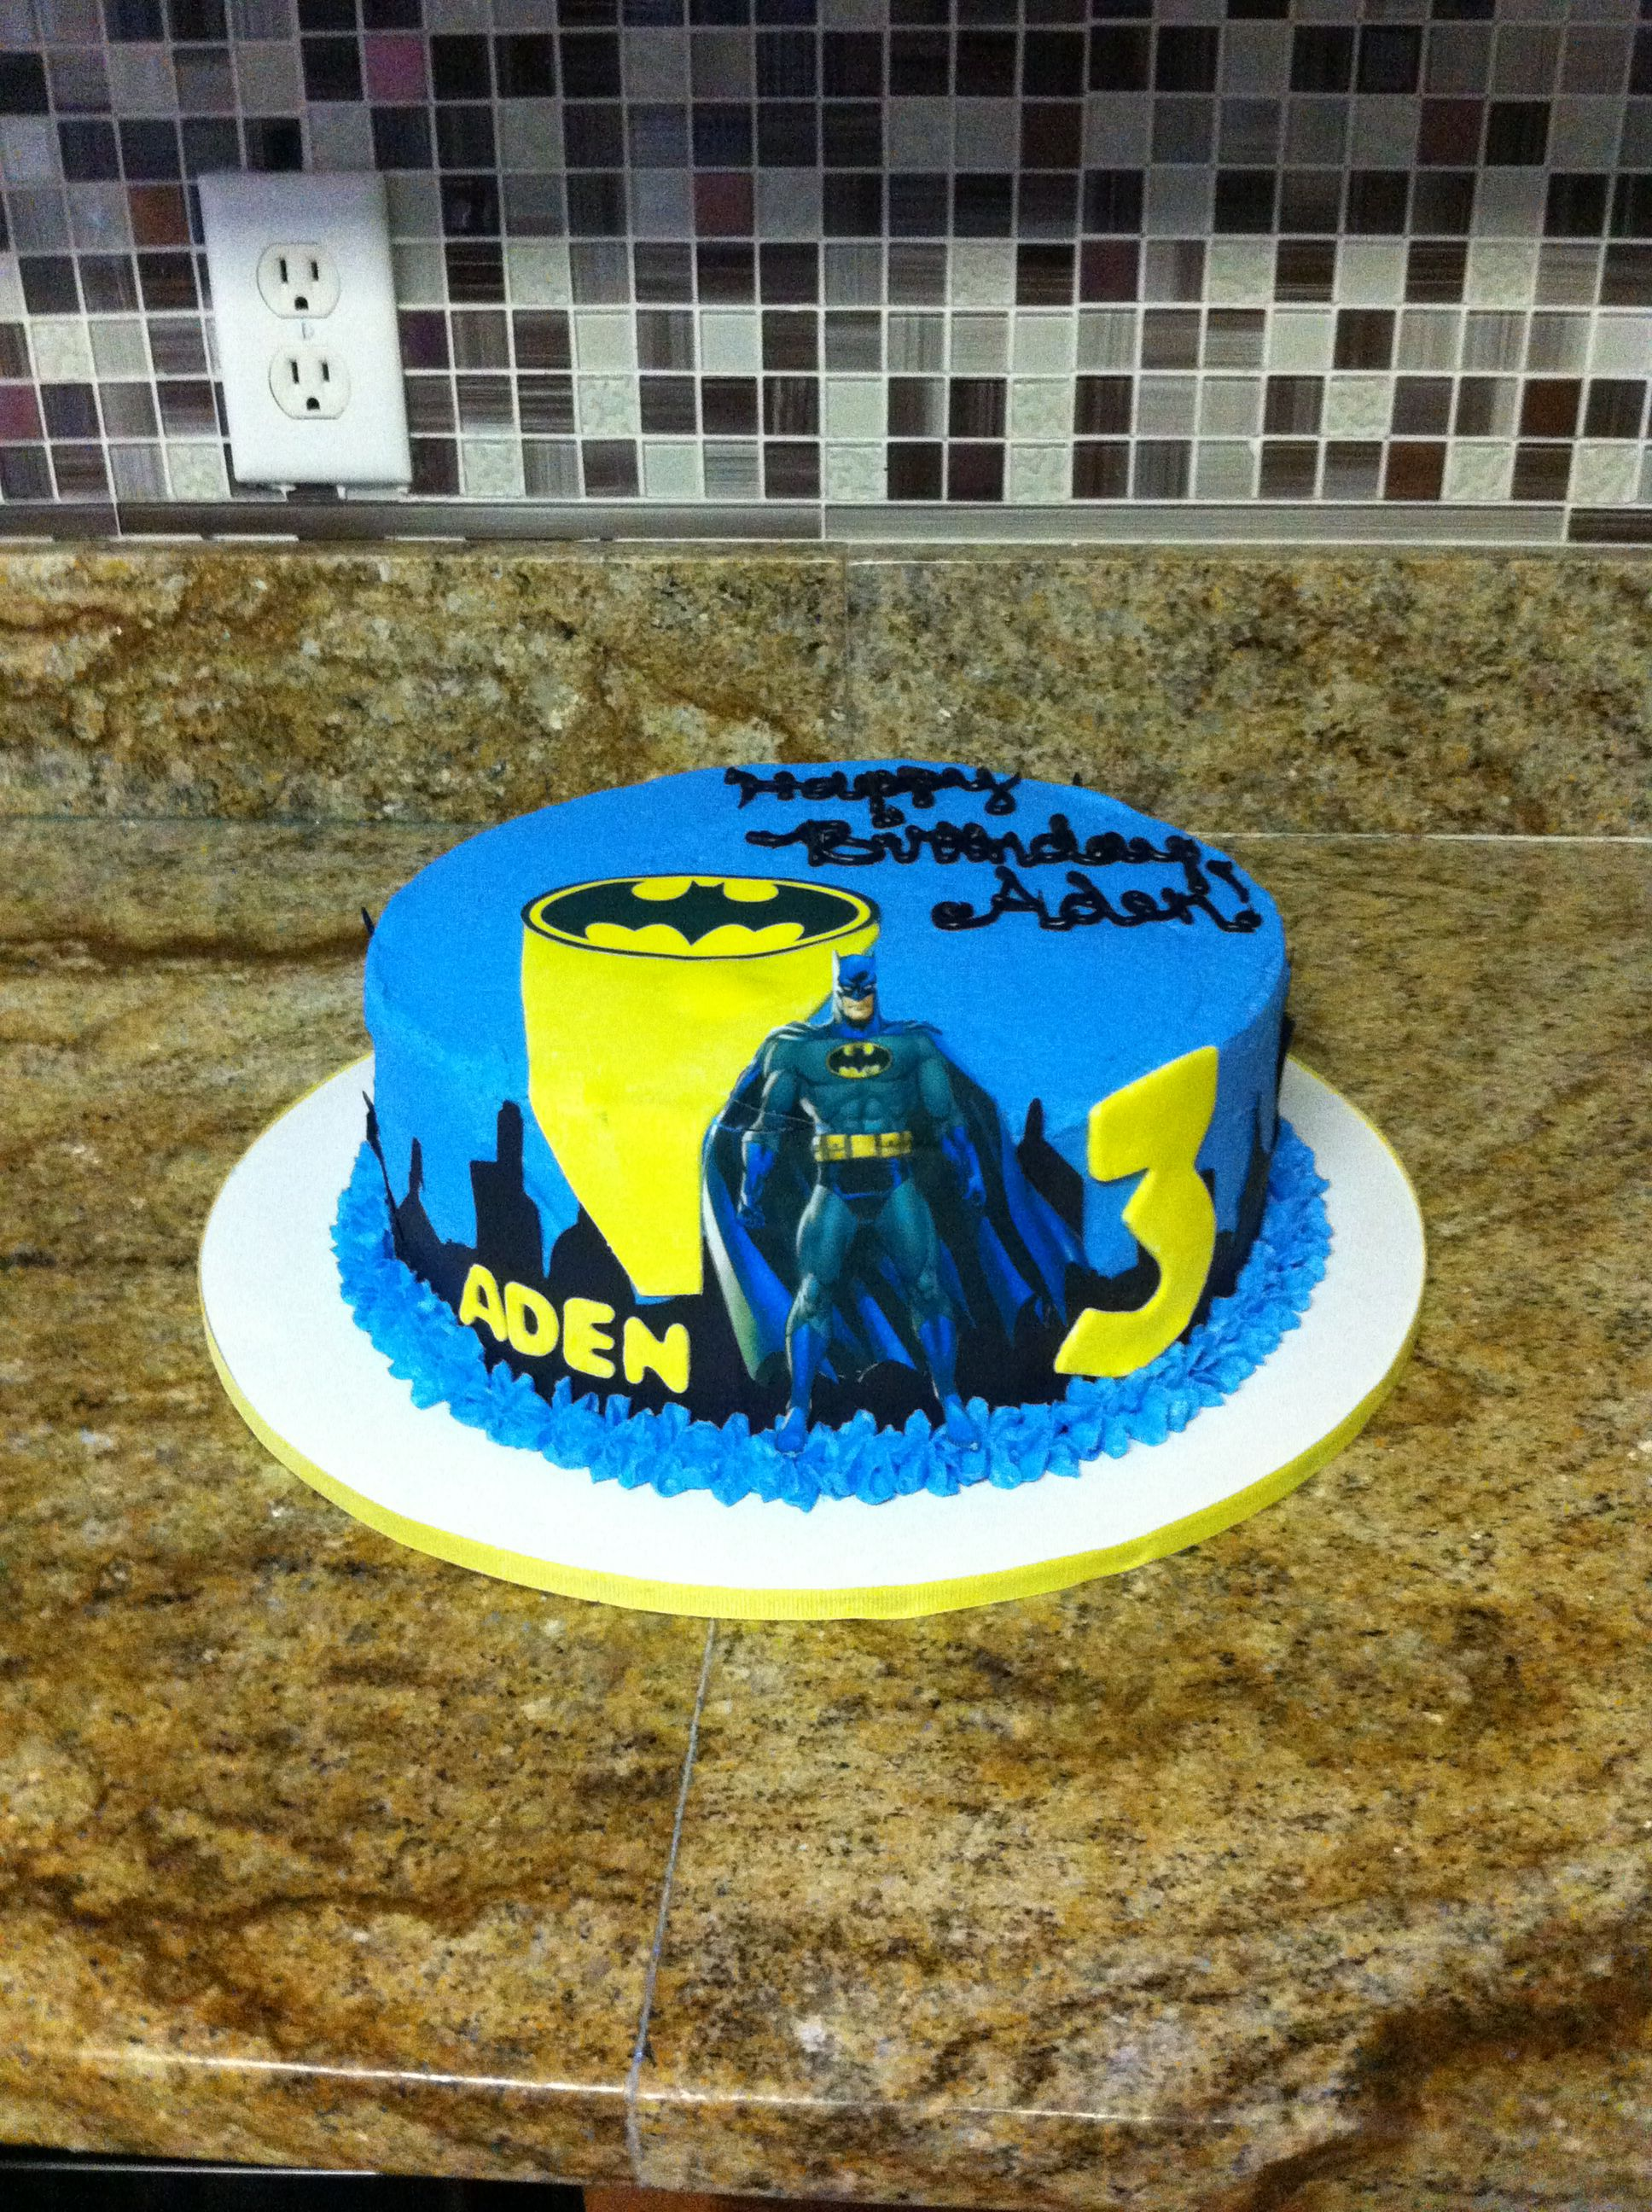 Batman Cake 10 Inch Cake With Edible Icing Sheet Gotham